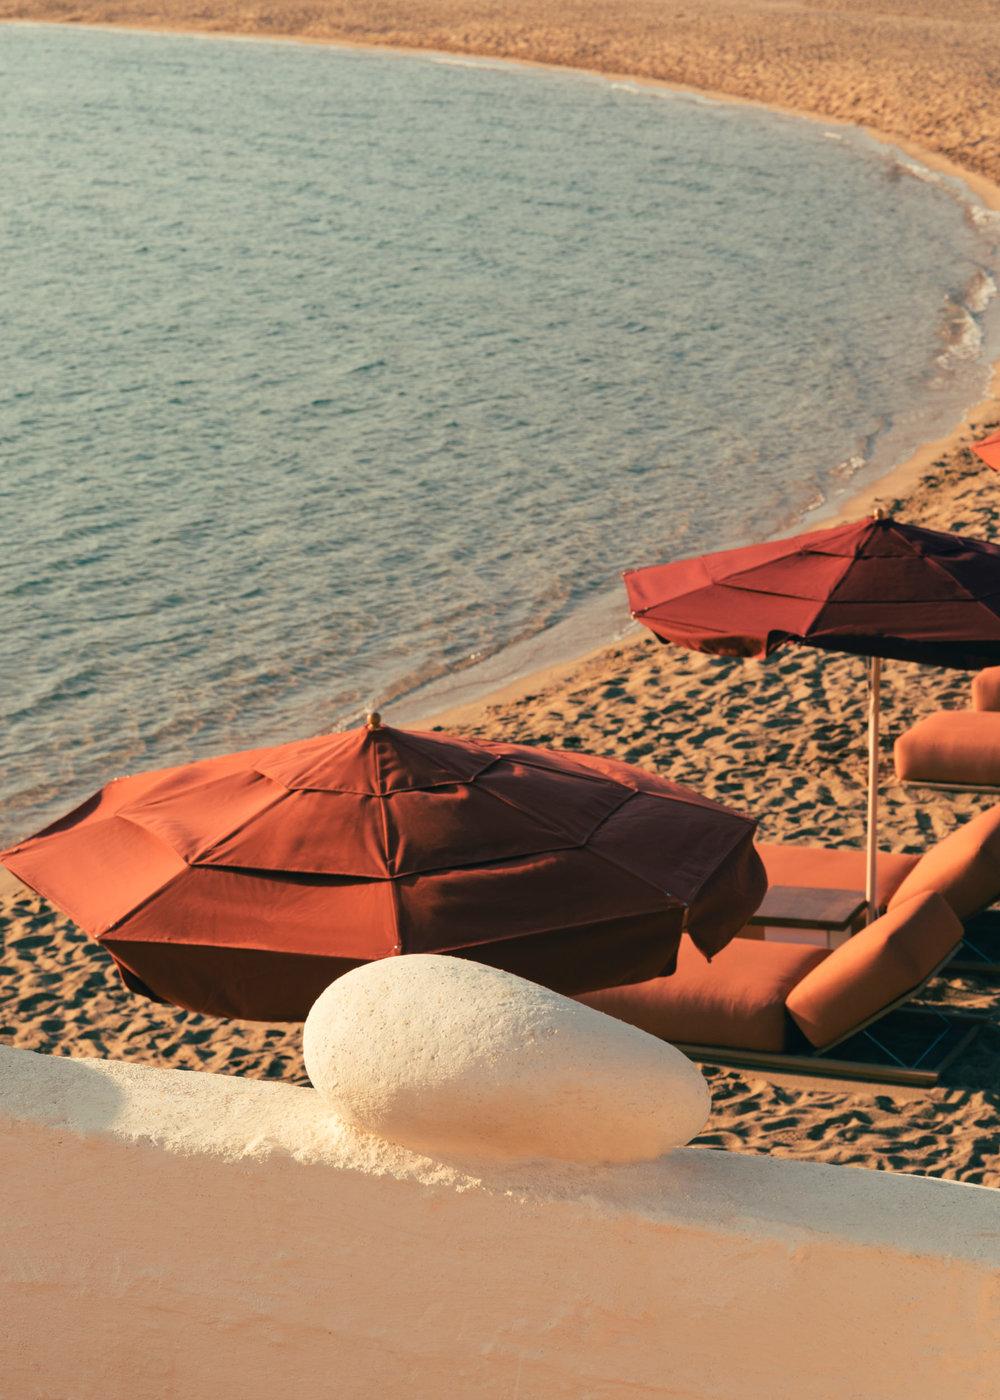 Ftelia+Beach+Club+by+Fabrizio+Casiraghi+on+Anniversary+Magazine.jpg